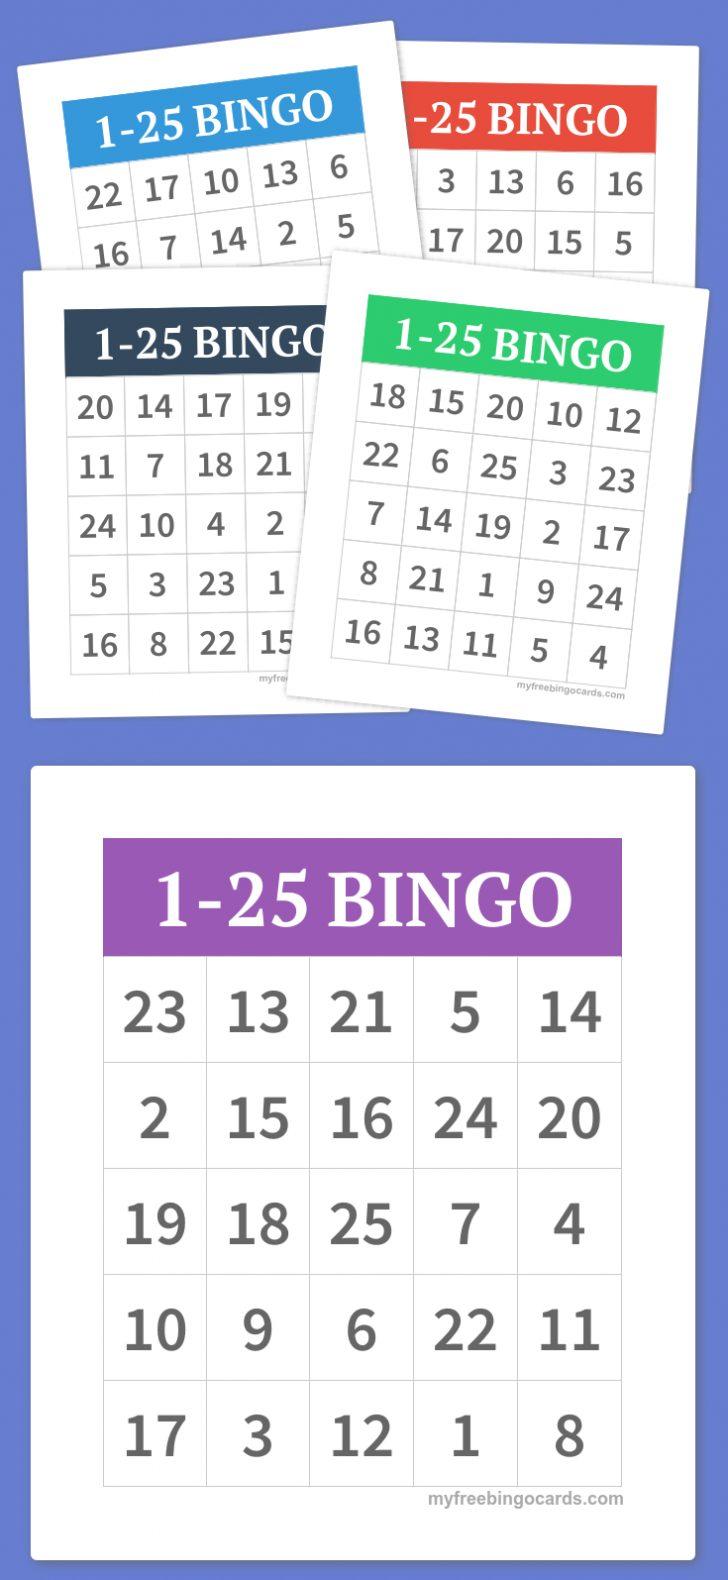 Bingo Cards Printable 1-50